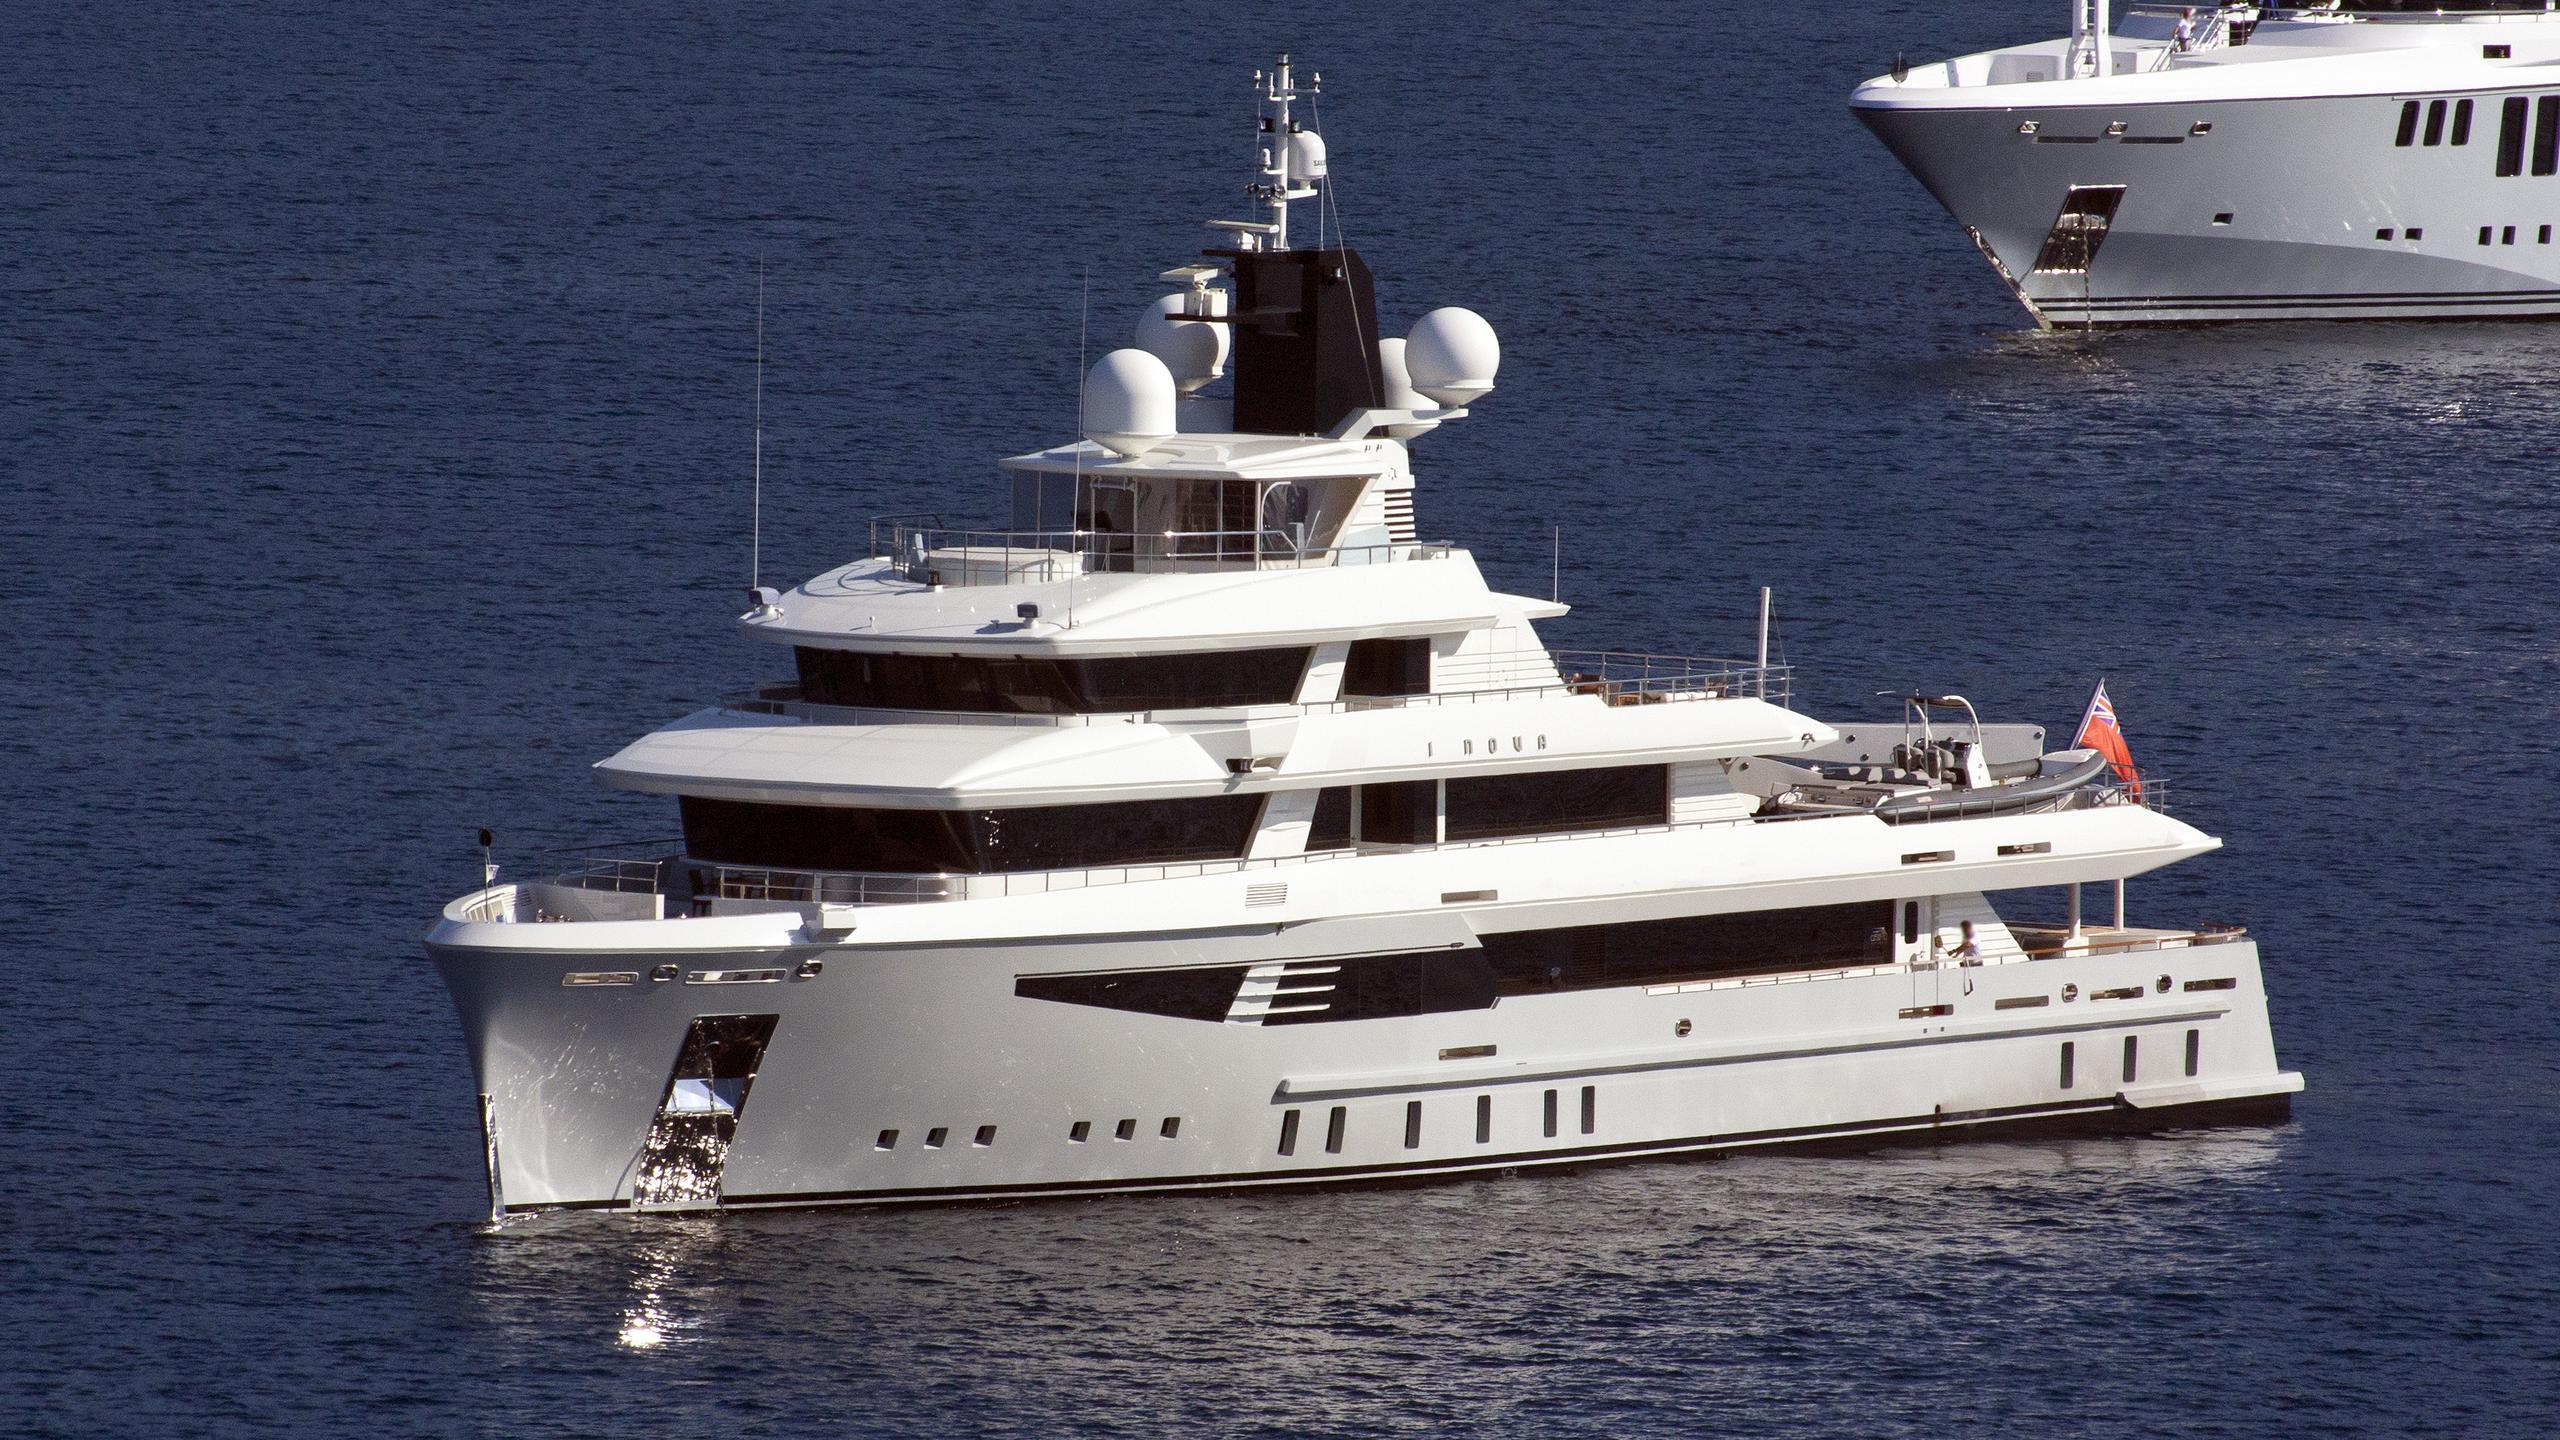 i-nova-explorer-yacht-cosmo-2013-50m-half-profile